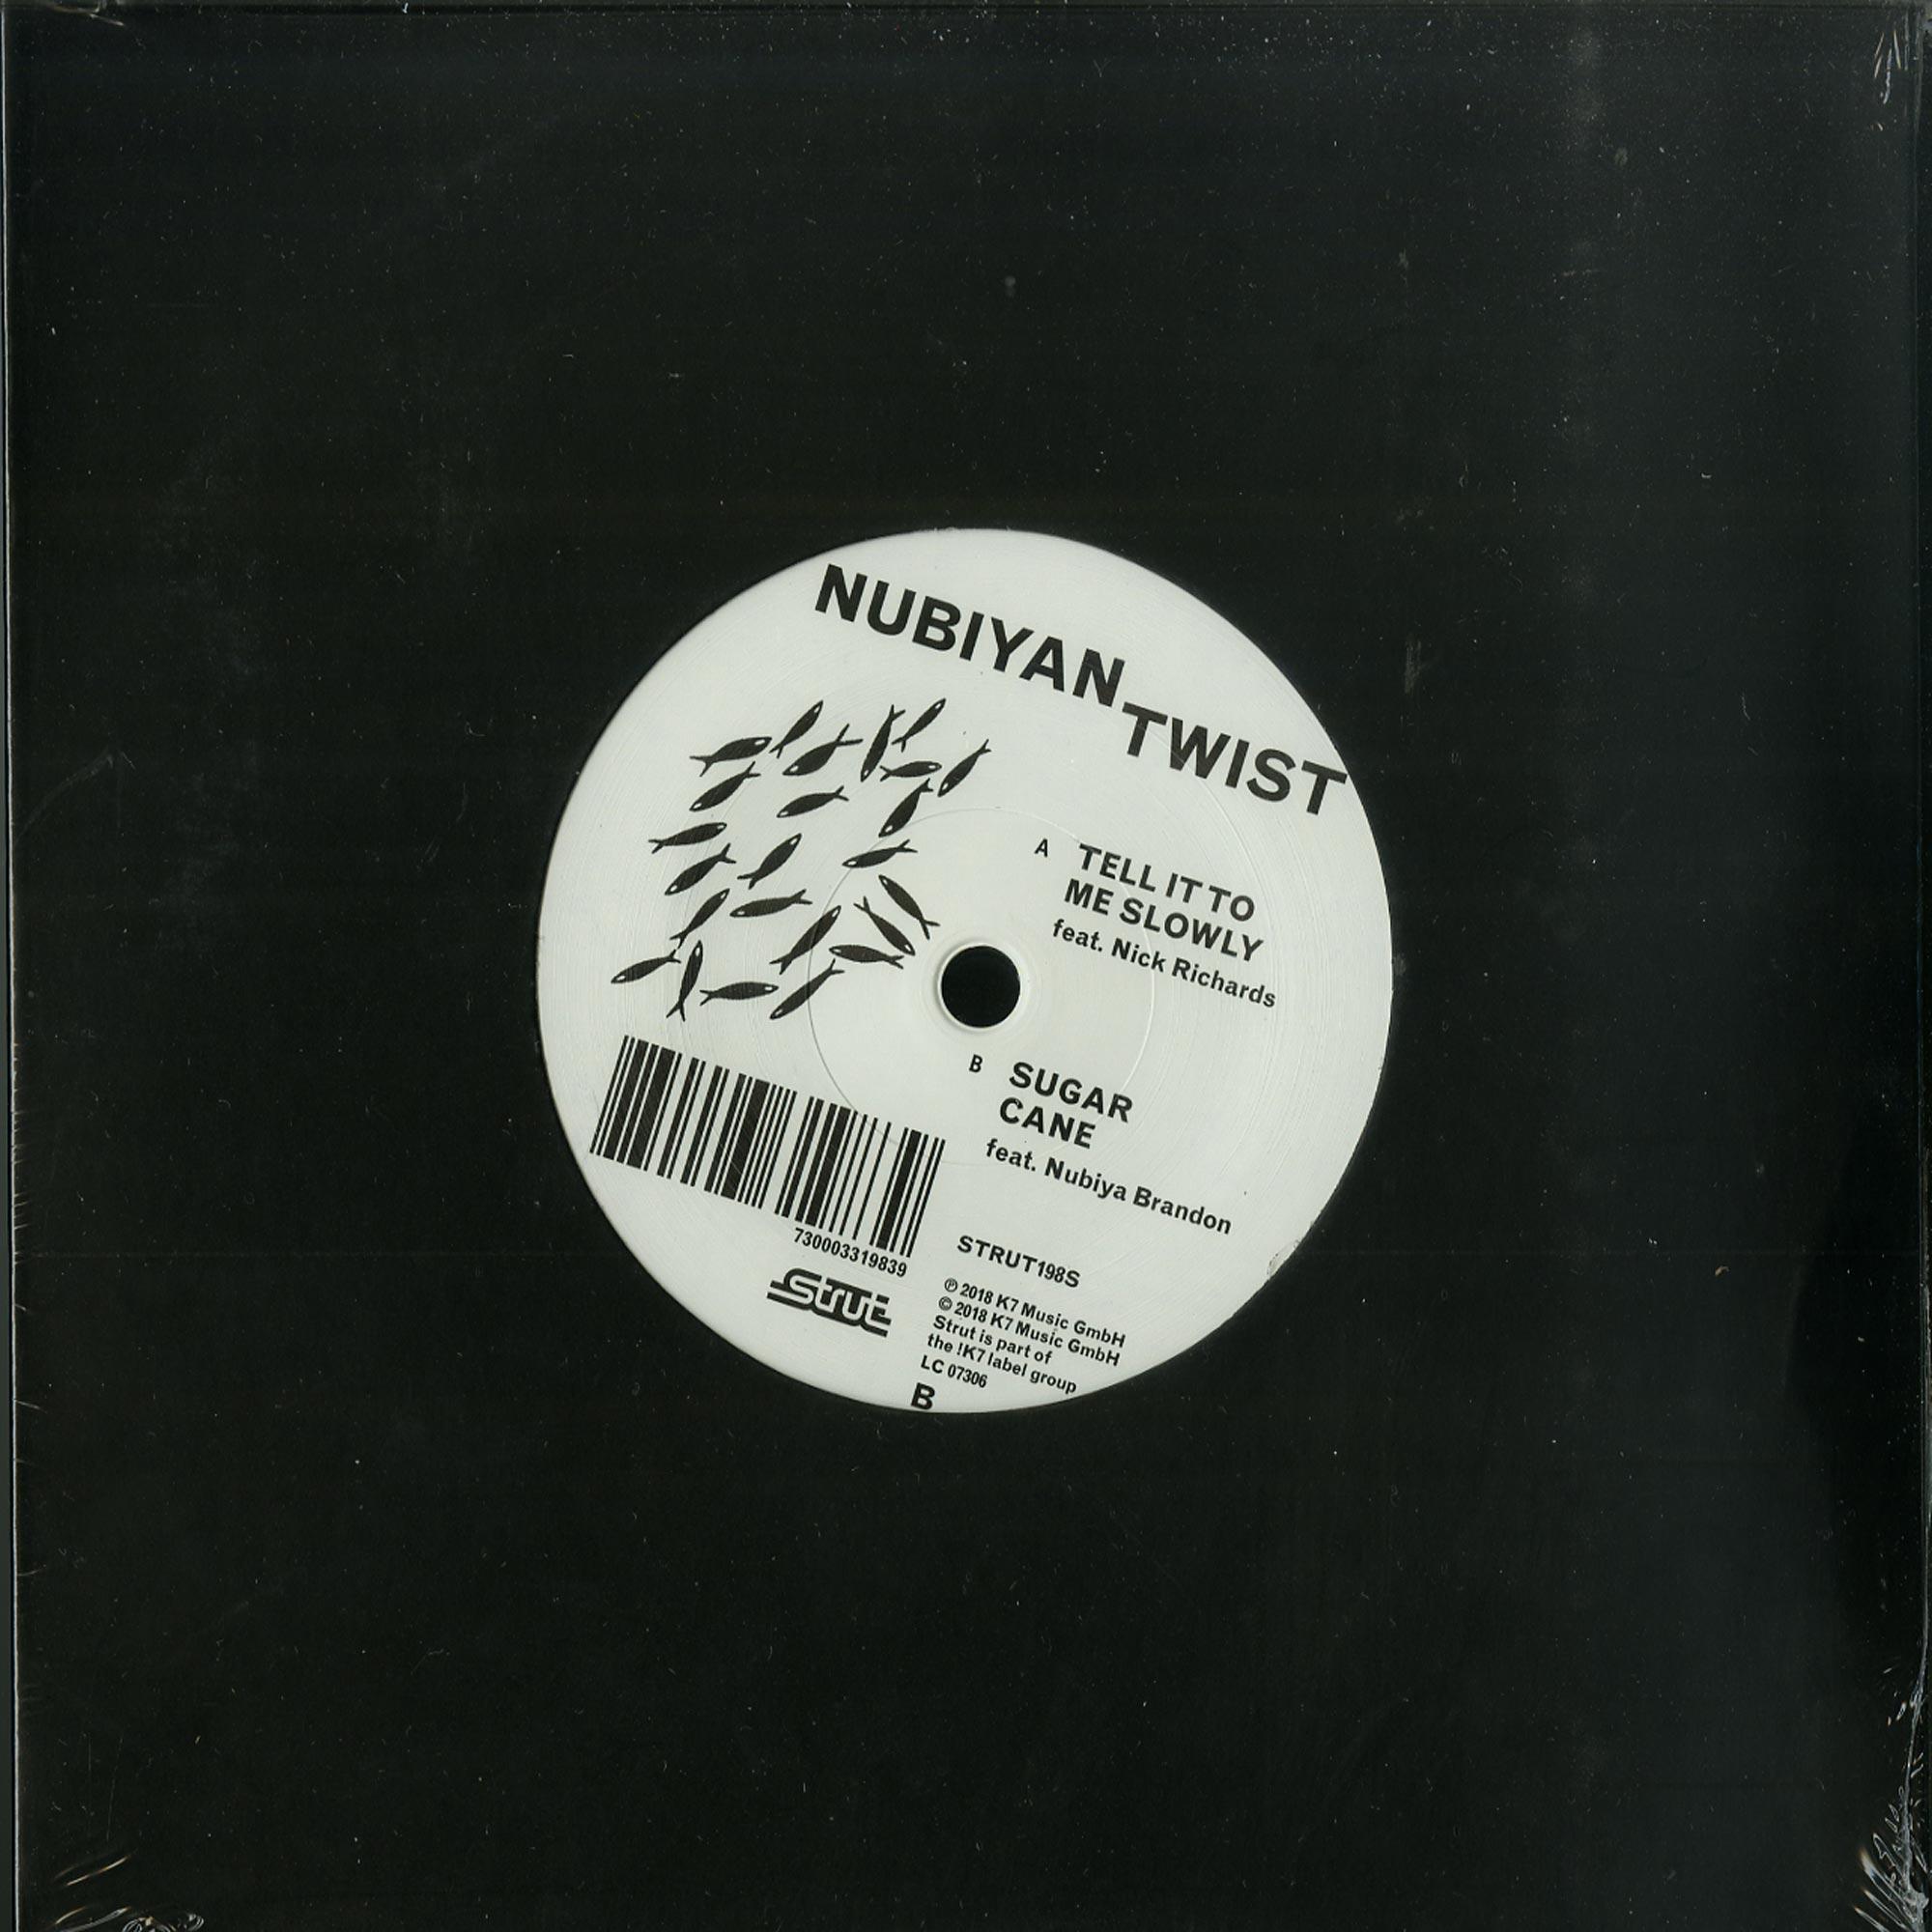 Nubiyan Twist - TELL IT TO ME SLOWLY